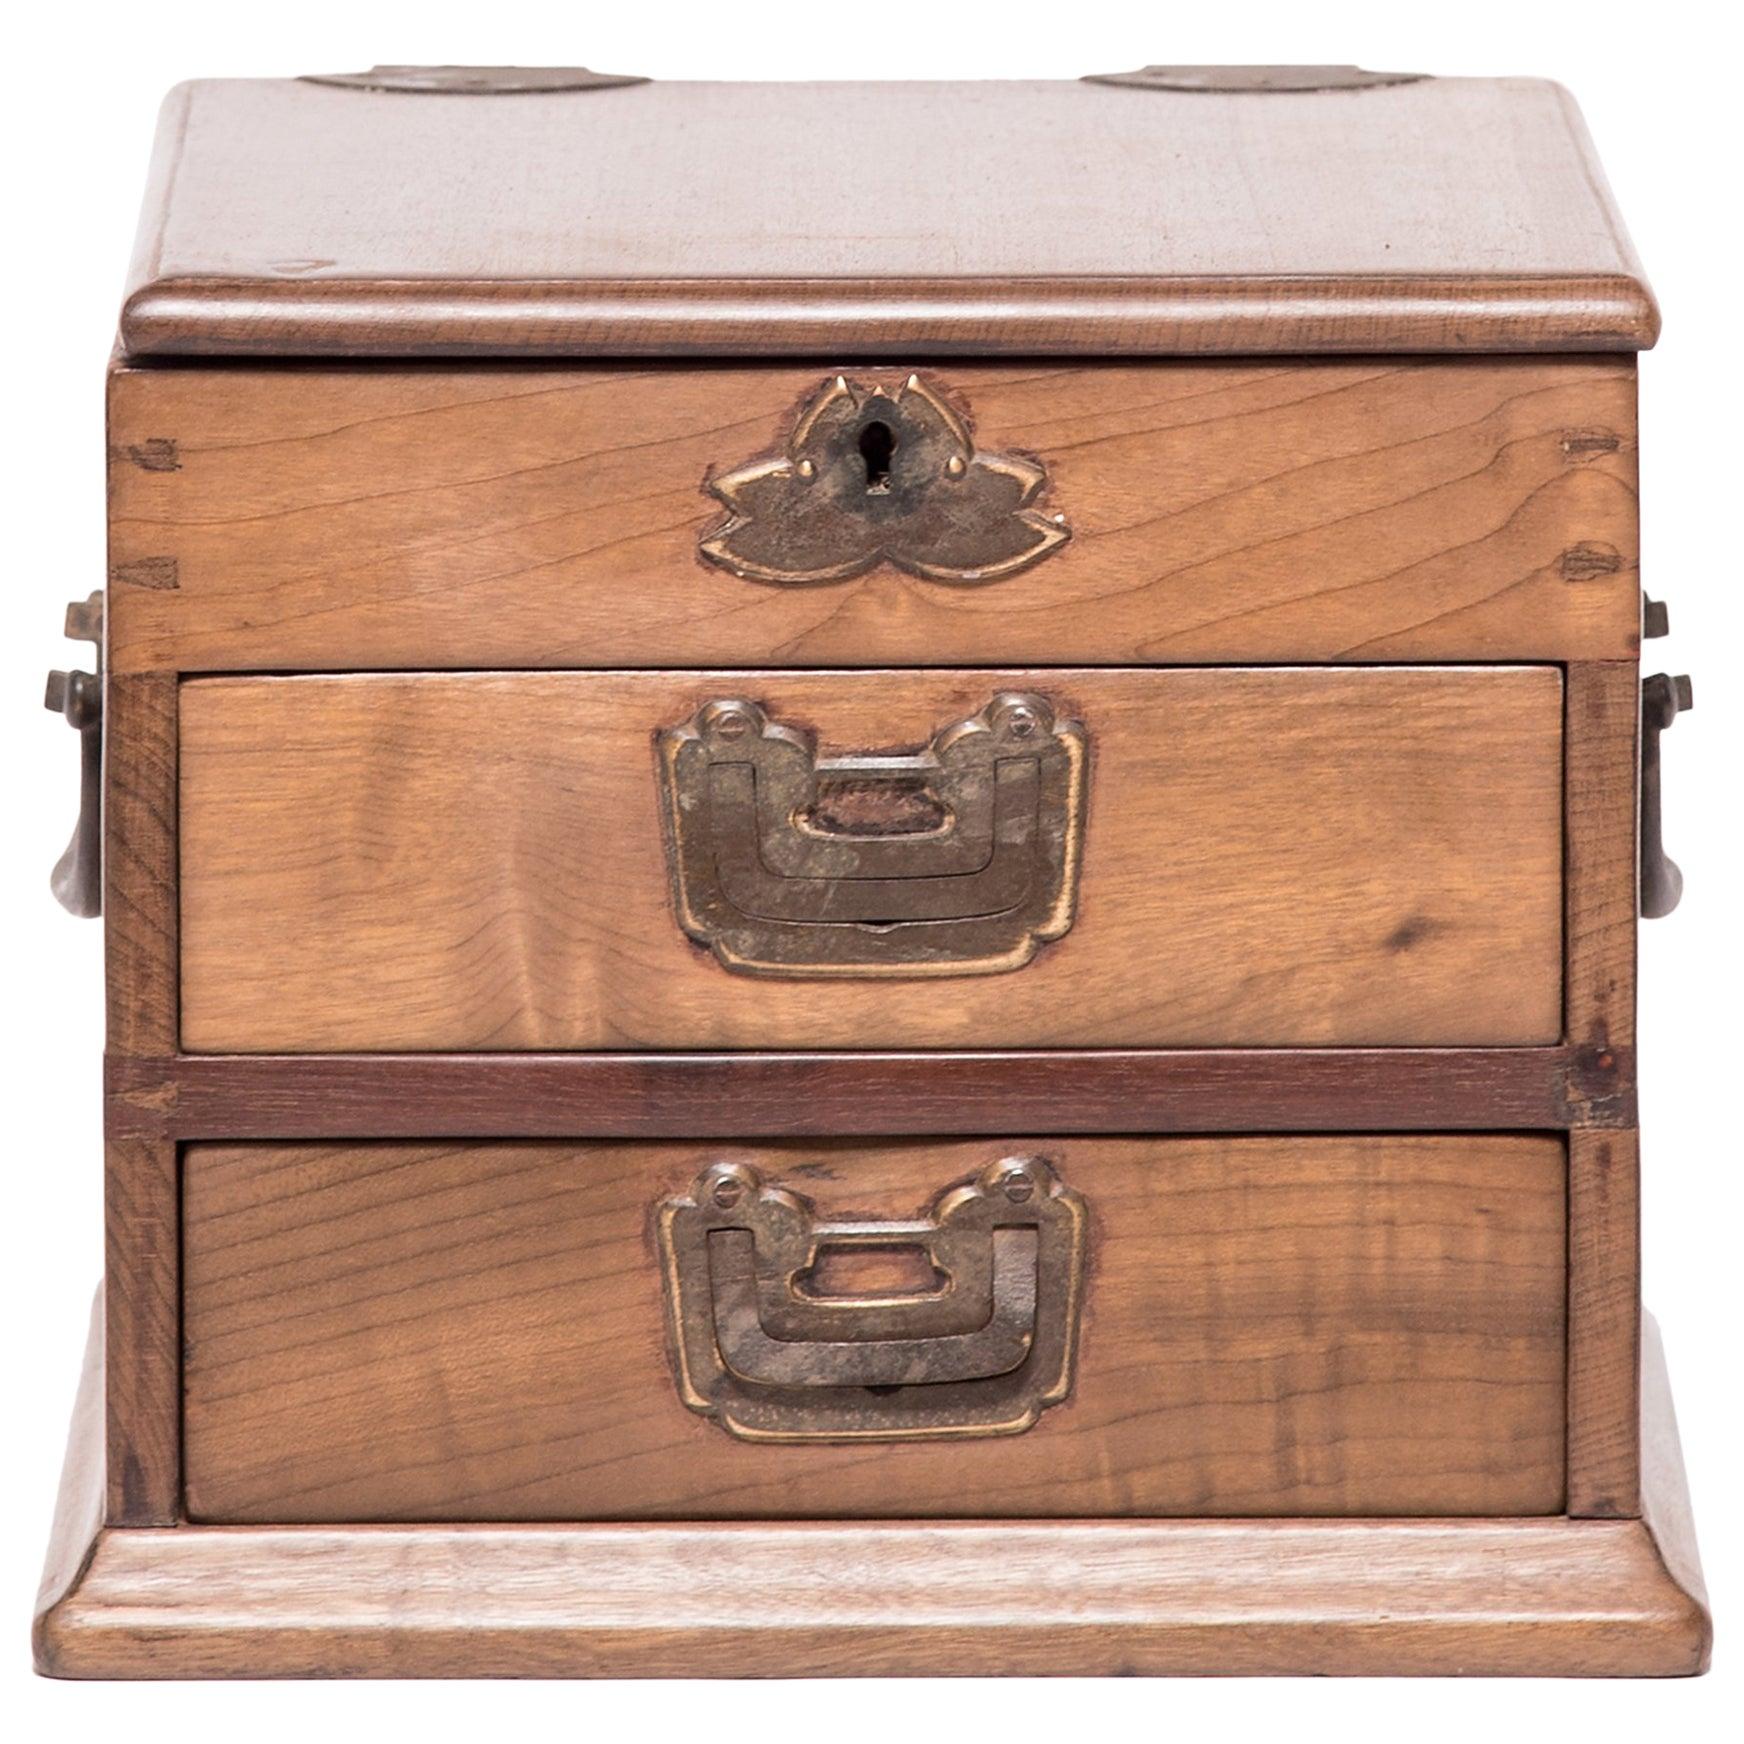 Early 20th Century Chinese Ruyi Jewelry Box